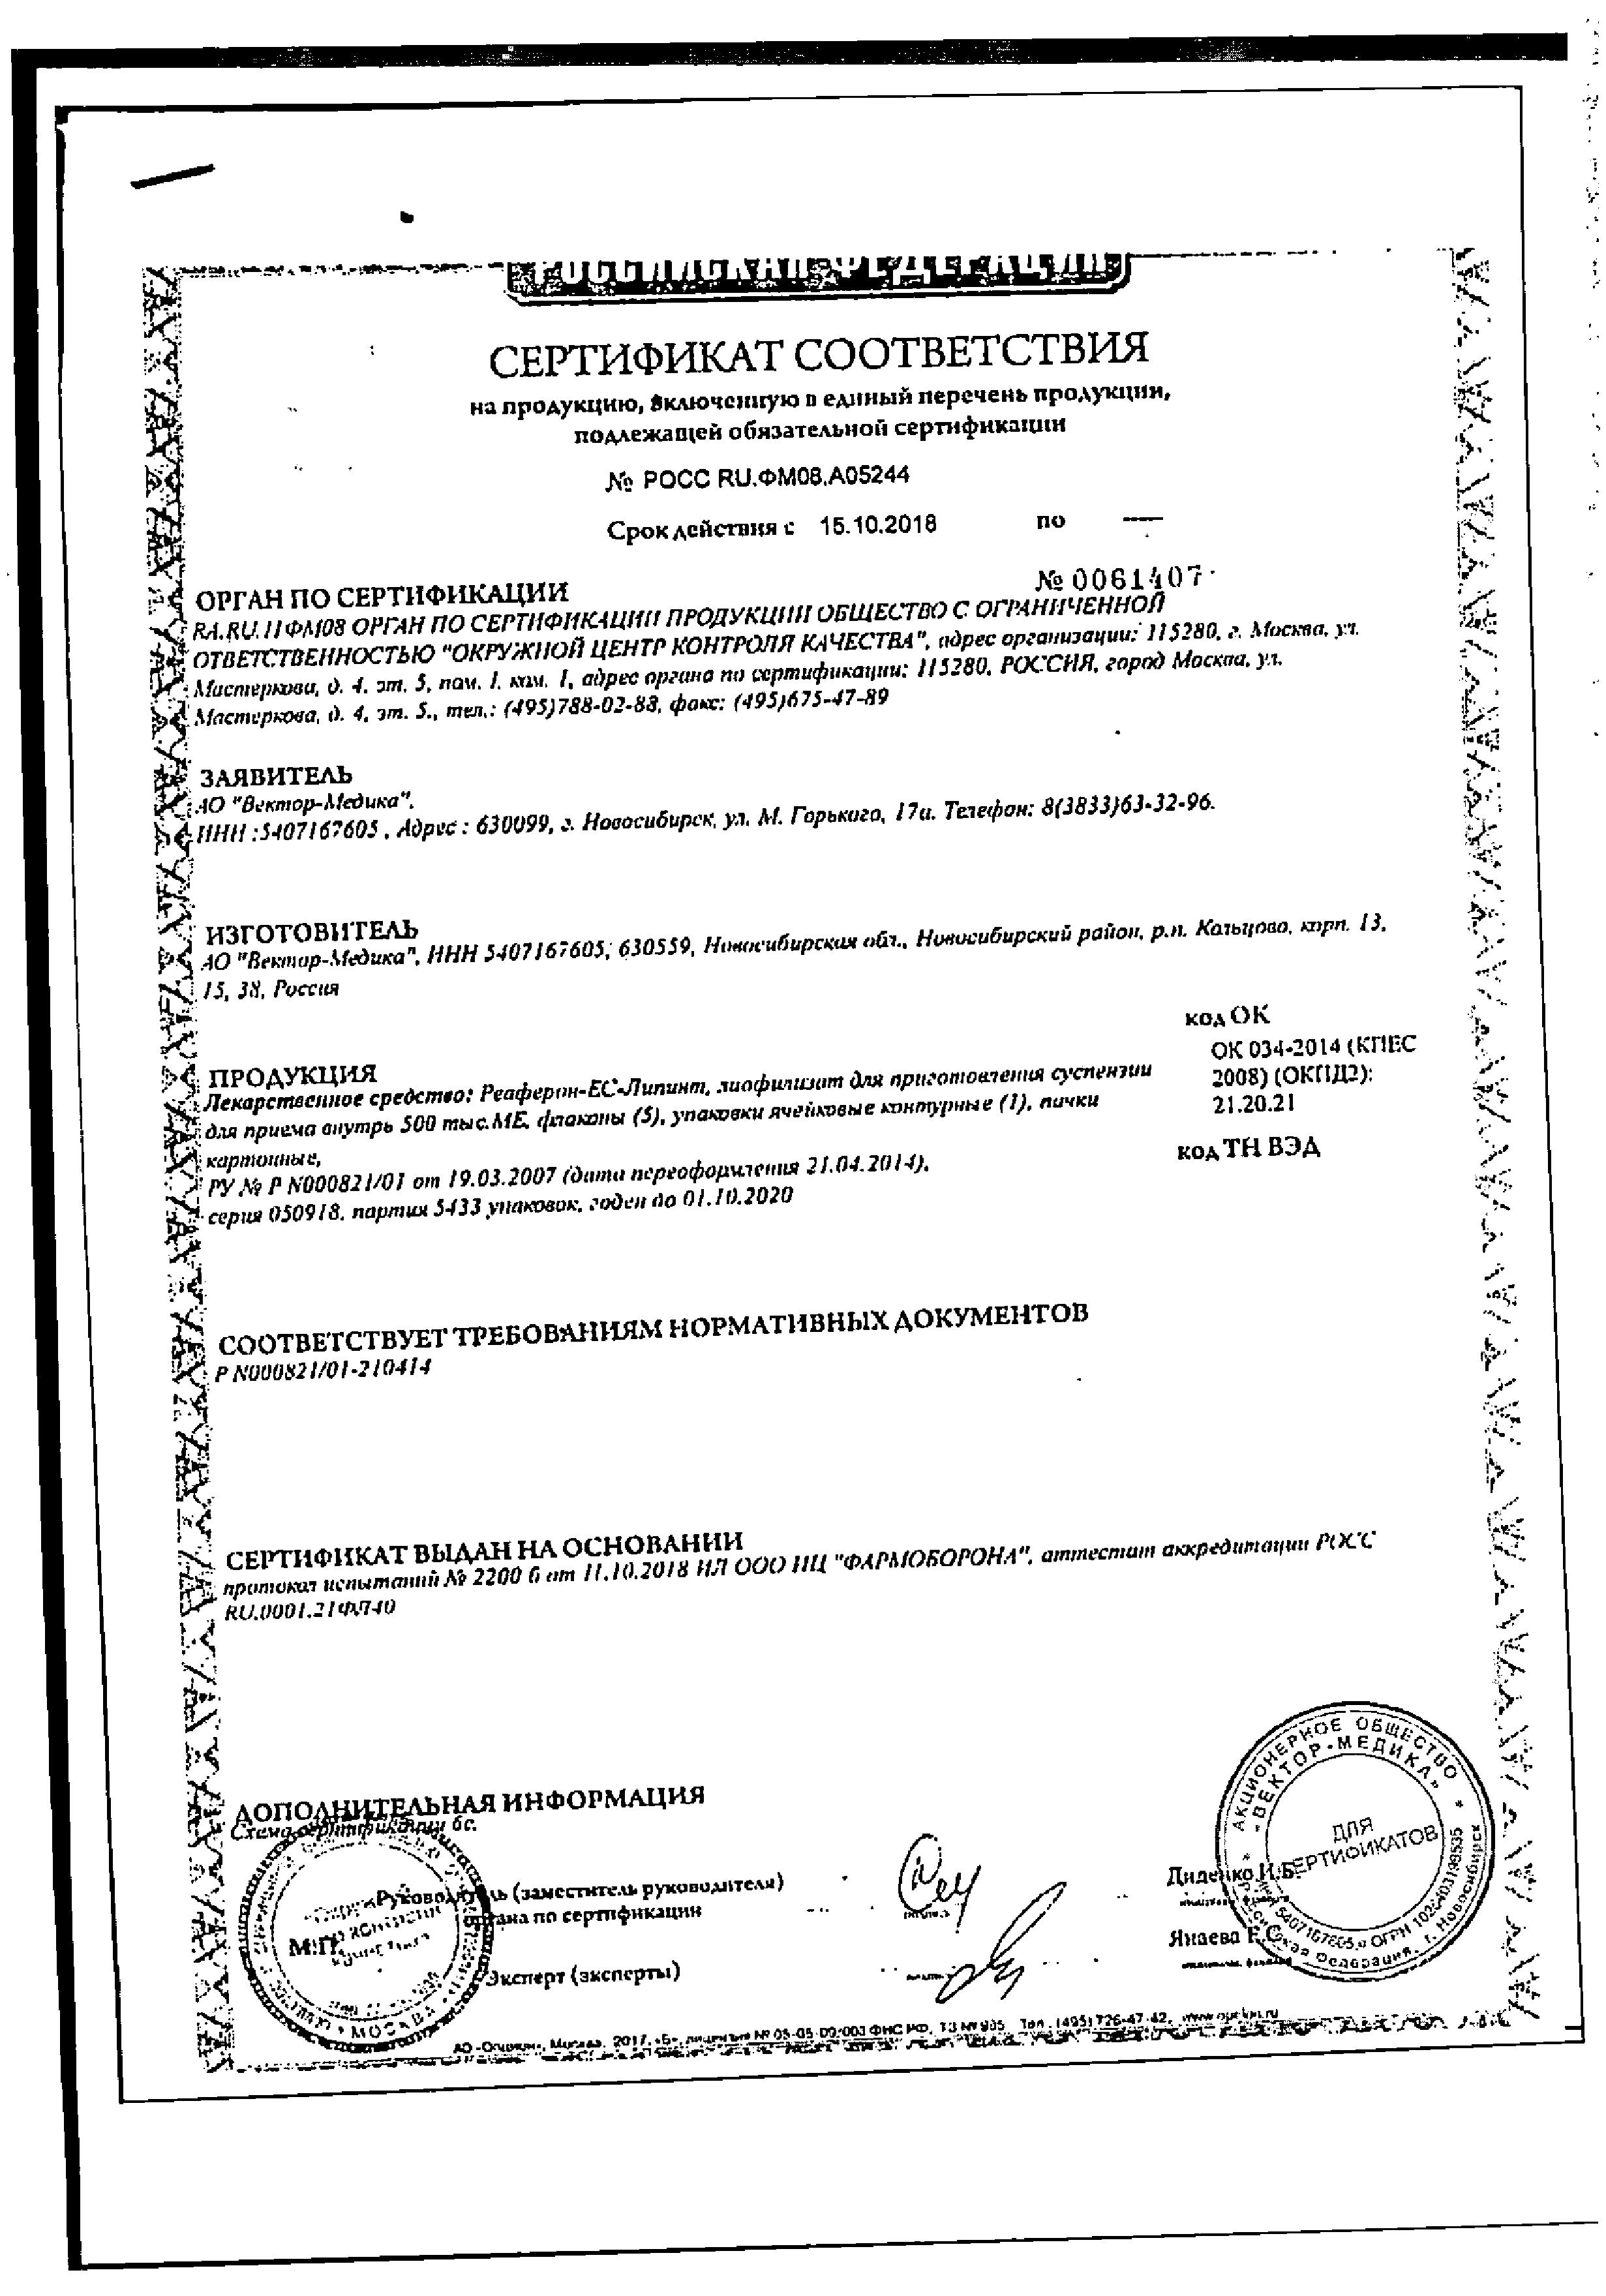 Реаферон-ЕС-Липинт сертификат